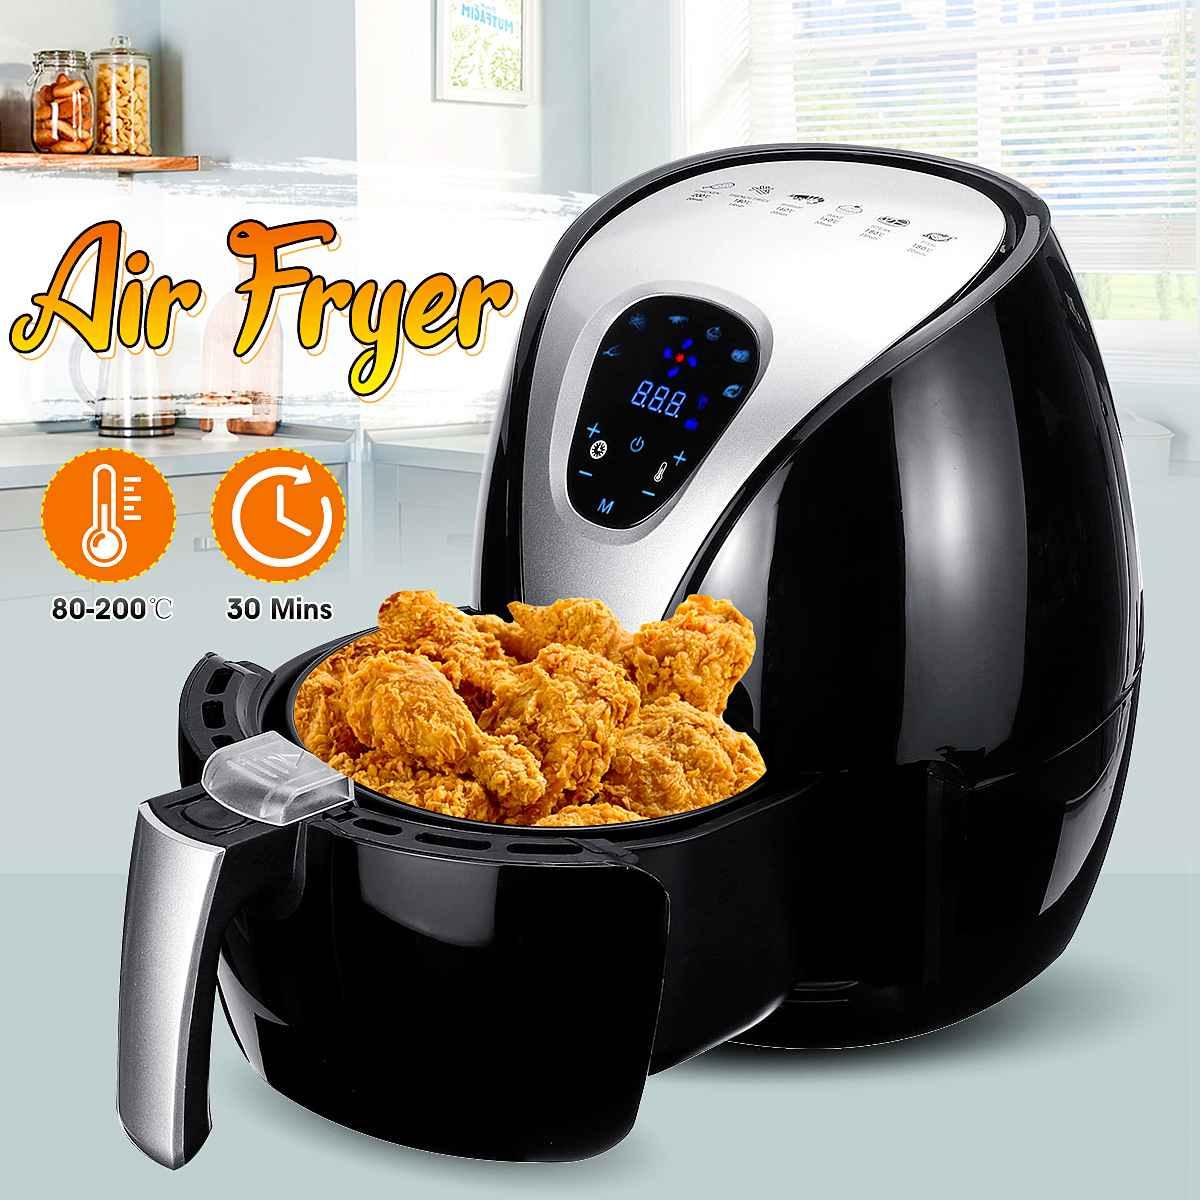 1500W Air Fryer Multi-Functional Digital Health Cooker Timer Oven Low Fat Oil Free 6 Preset Food Grilling Roasting Deep Fryer